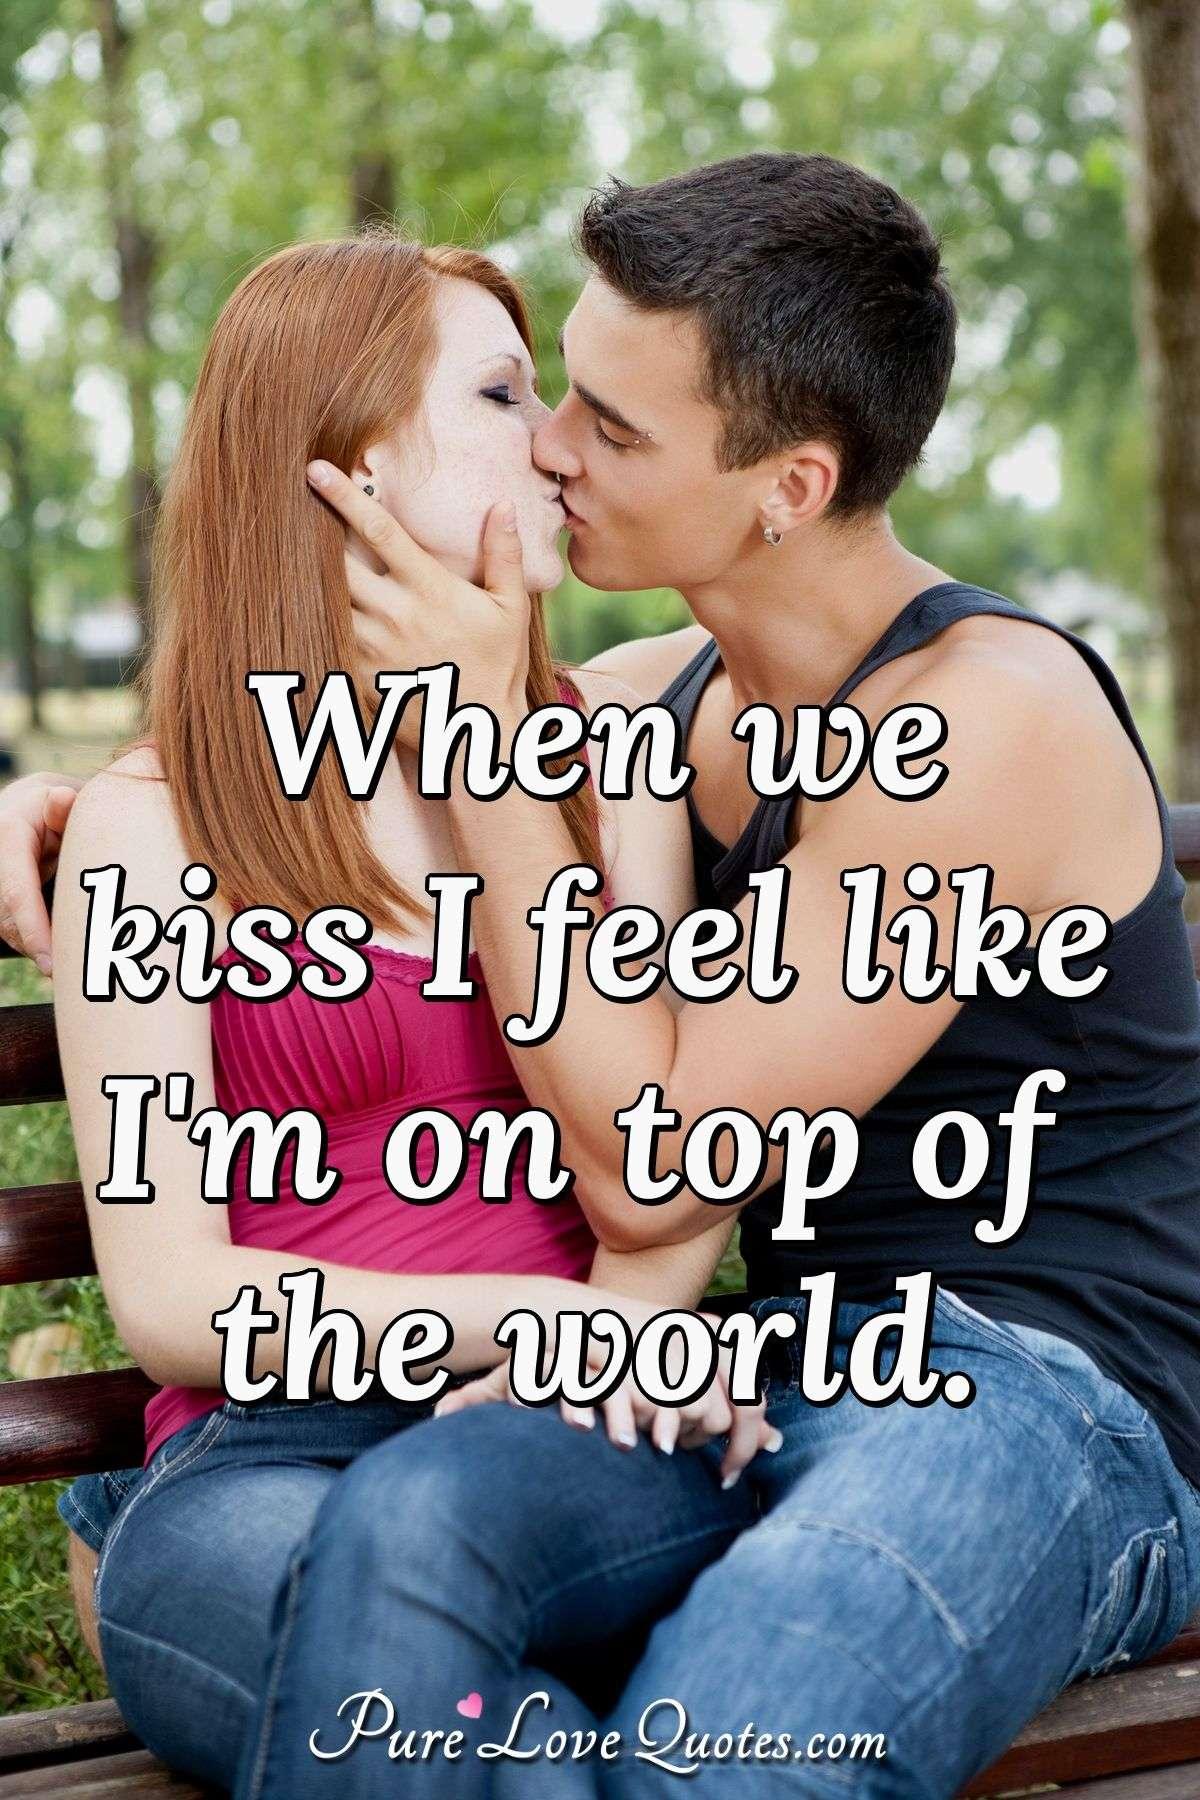 When we kiss I feel like Im on top of the world